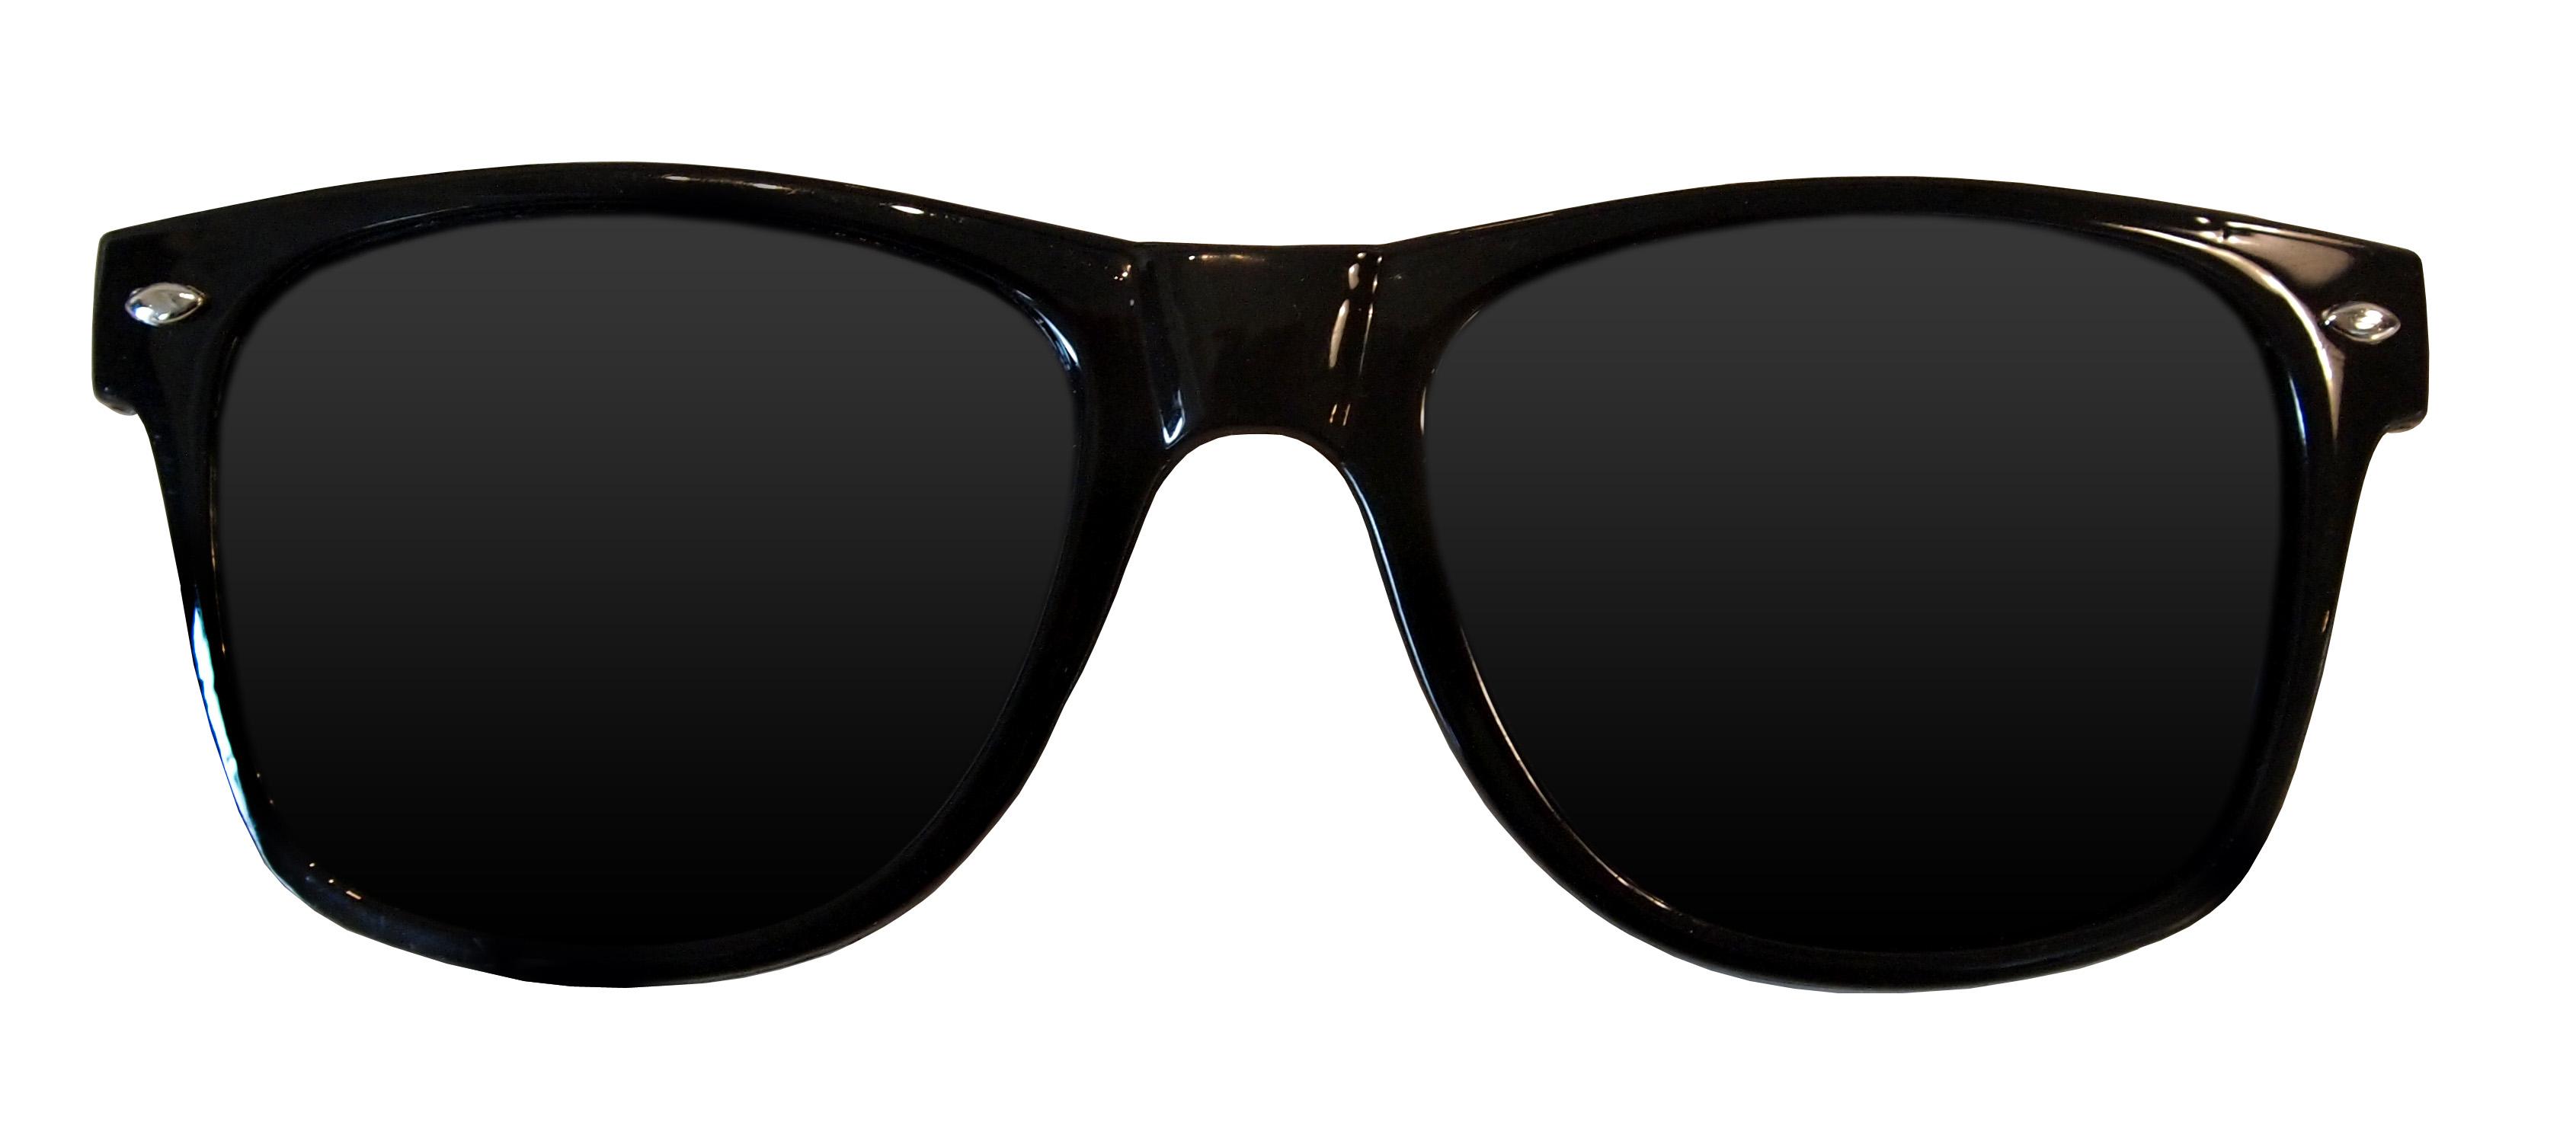 Black Sunglasses - ClipArt Best